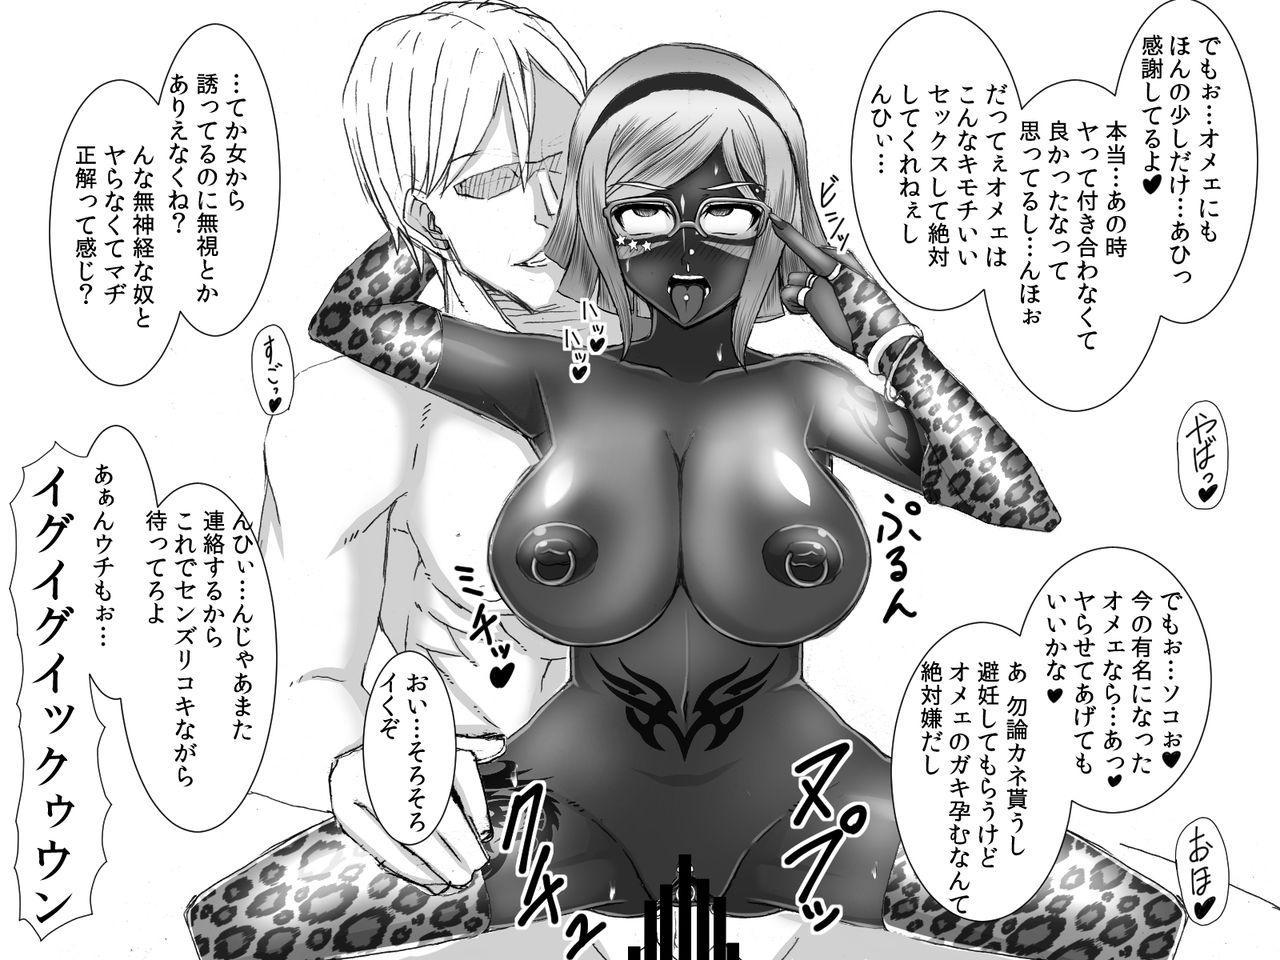 Kusurizuke! Sennou! Kikai Kaizou! Kuroochi Bitch-ka Heroine +α 199